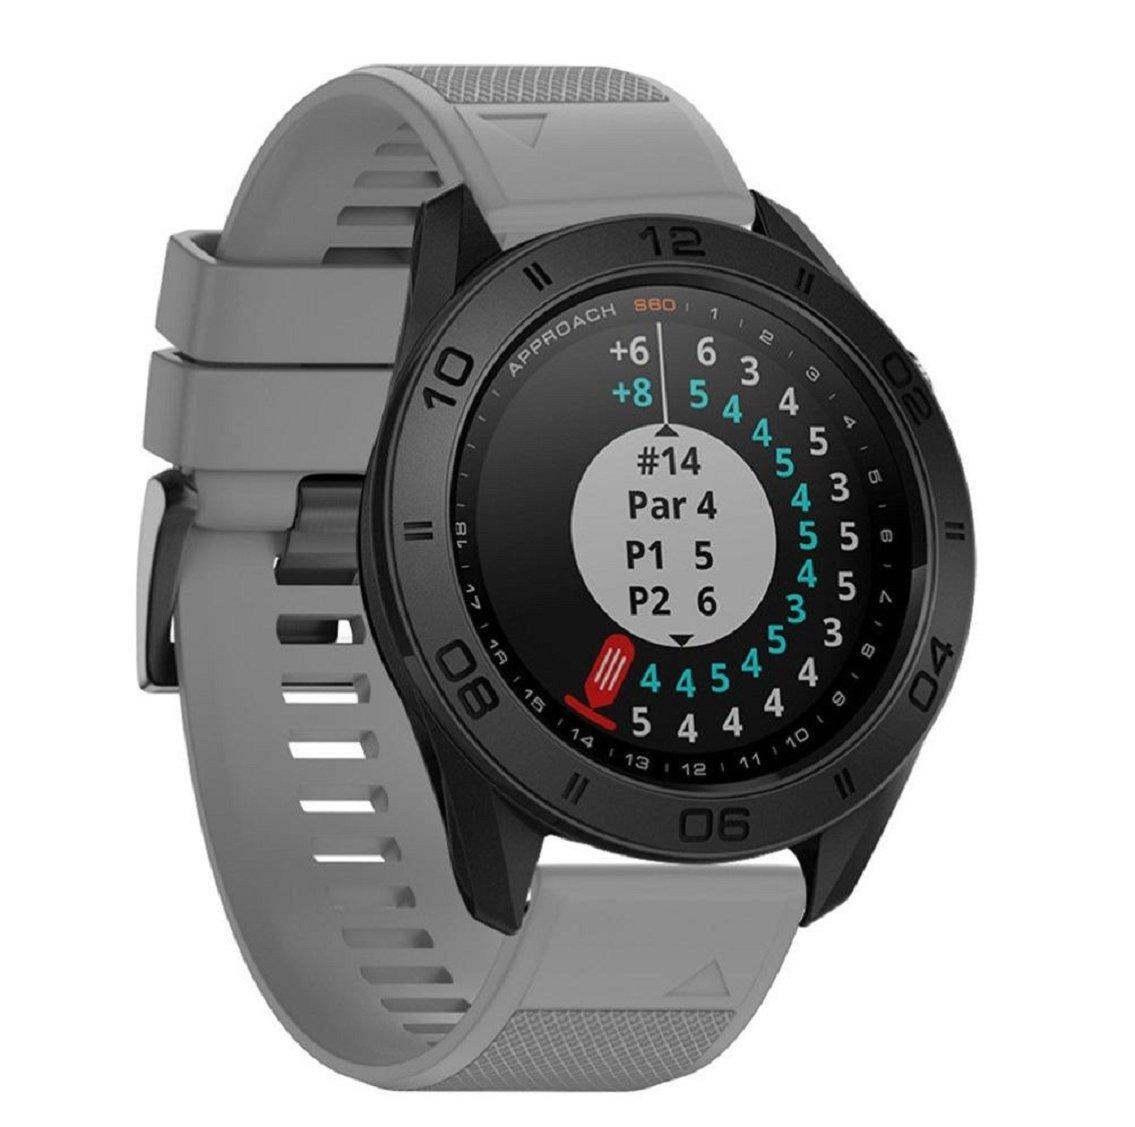 For Garmin Approach s60用時計バンド、vovomayスポーツシリコンストラップ交換用時計バンドGarmin Approach s60 Smartwatch  グレー B076GK4RPJ